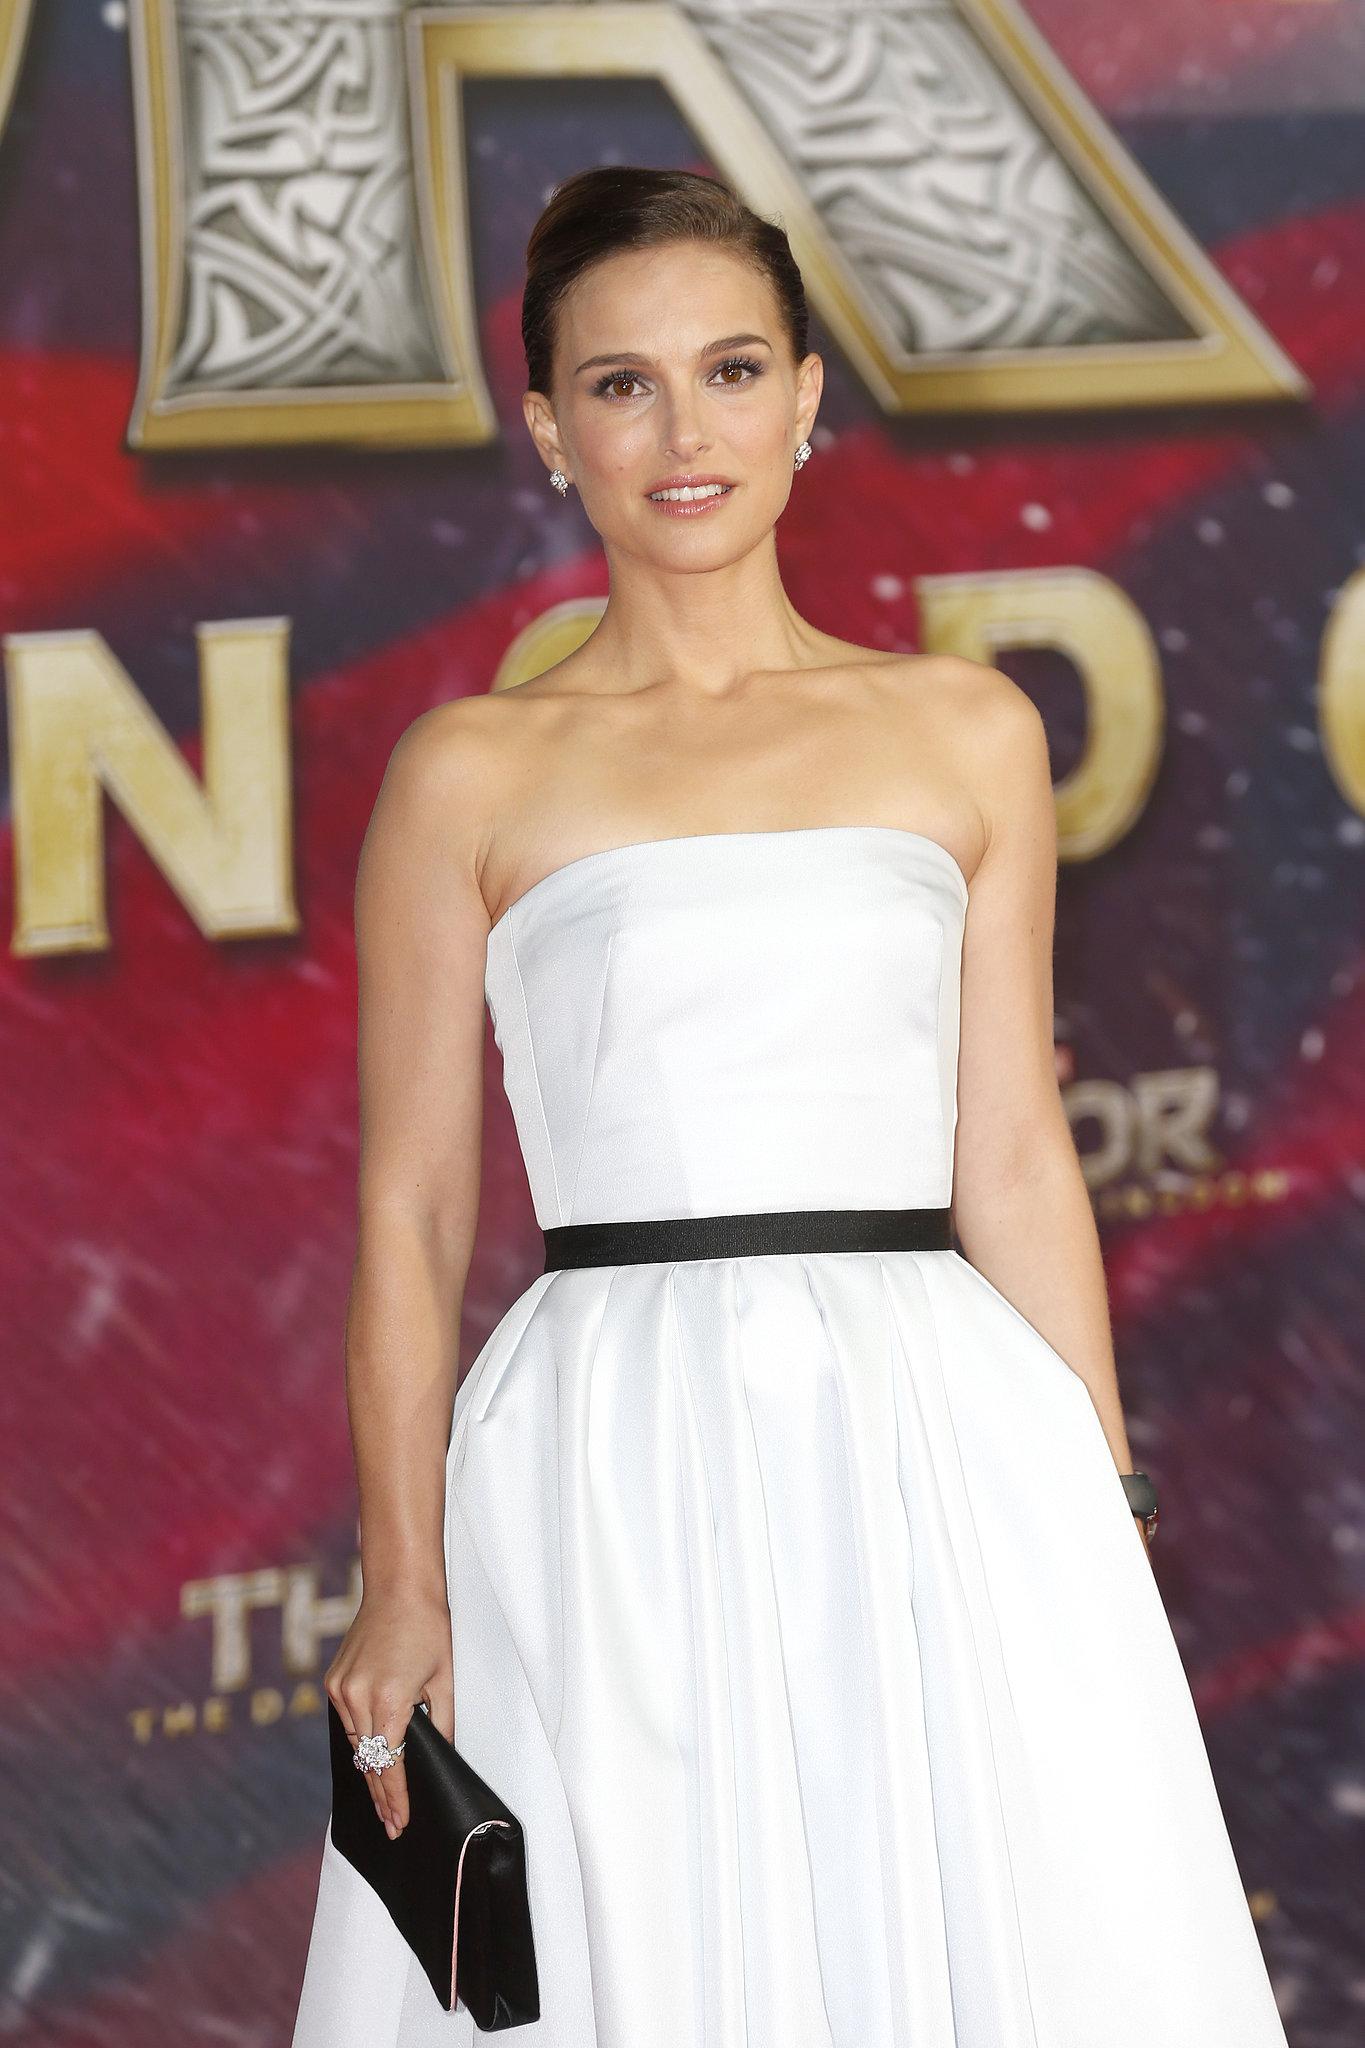 Natalie Portman dressed up for the Thor: The Dark World premiere.